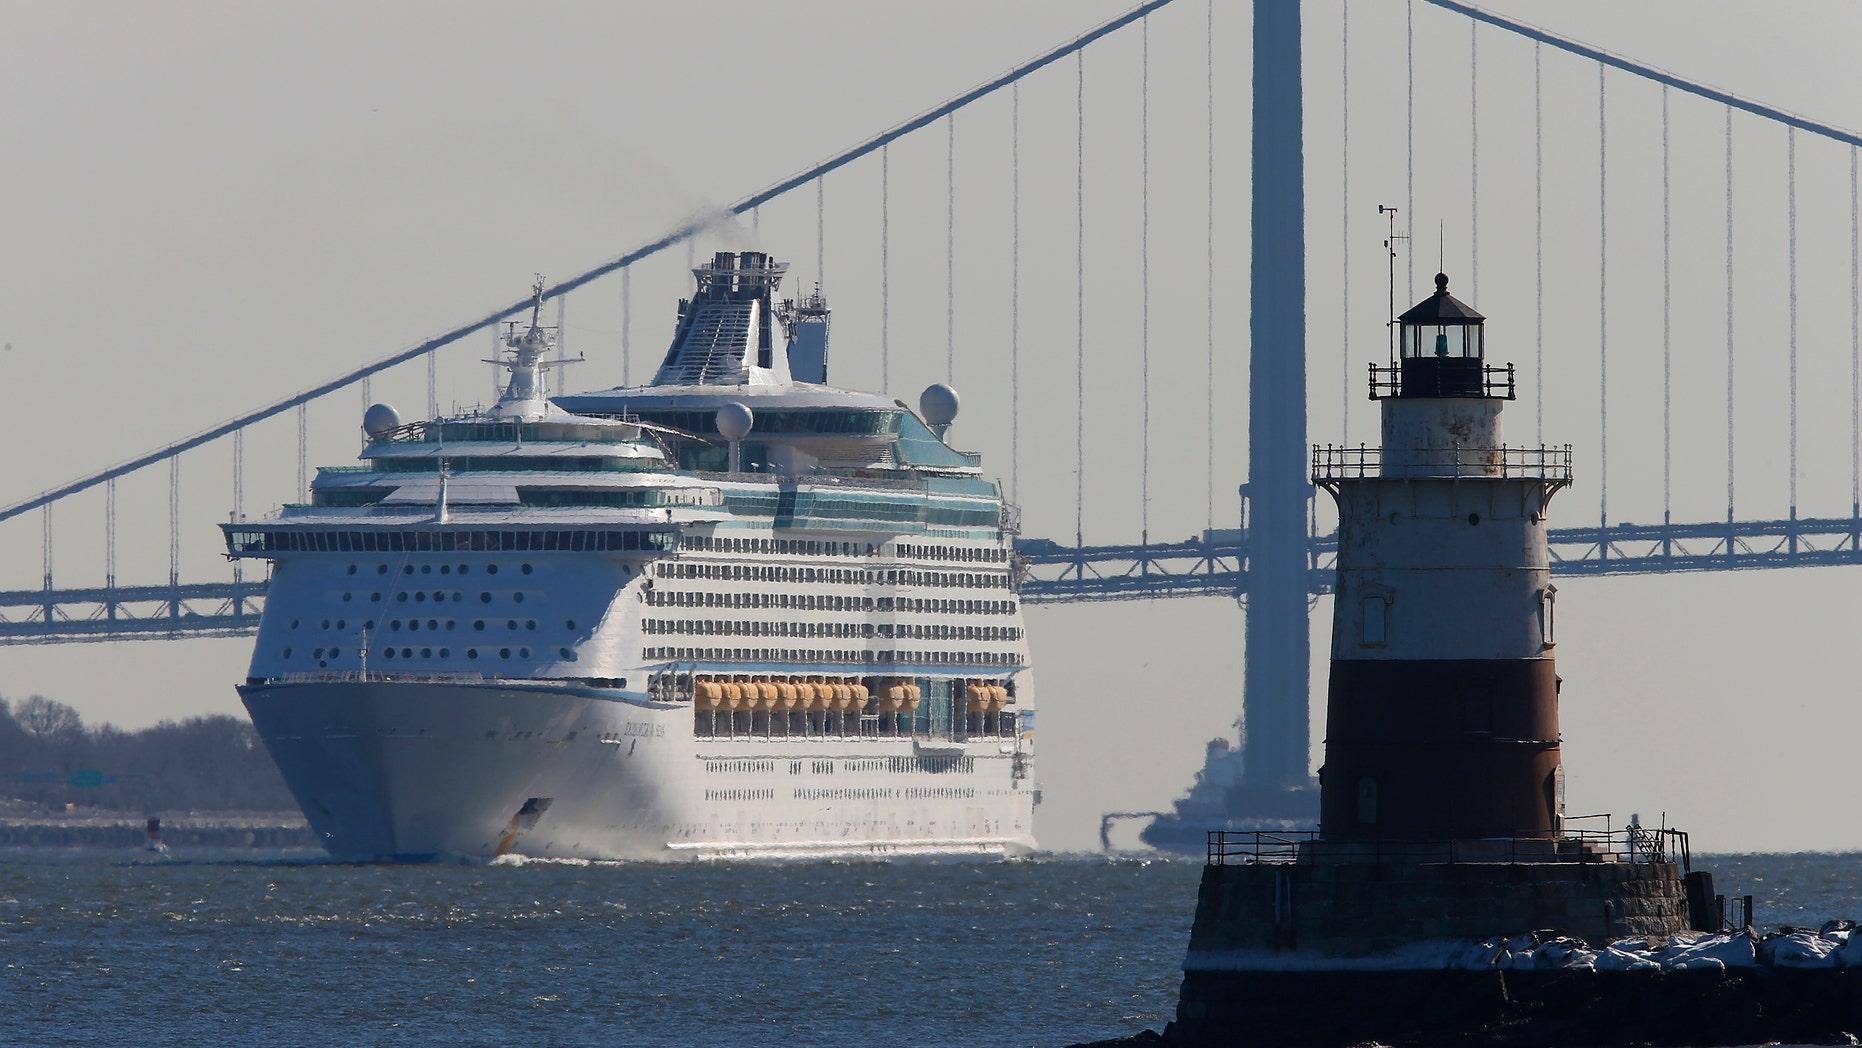 The Royal Caribbean's cruise ship Explorer of the Seas arrives back at Bayonne, New Jersey January 29, 2014. (REUTERS/Eduardo Munoz)